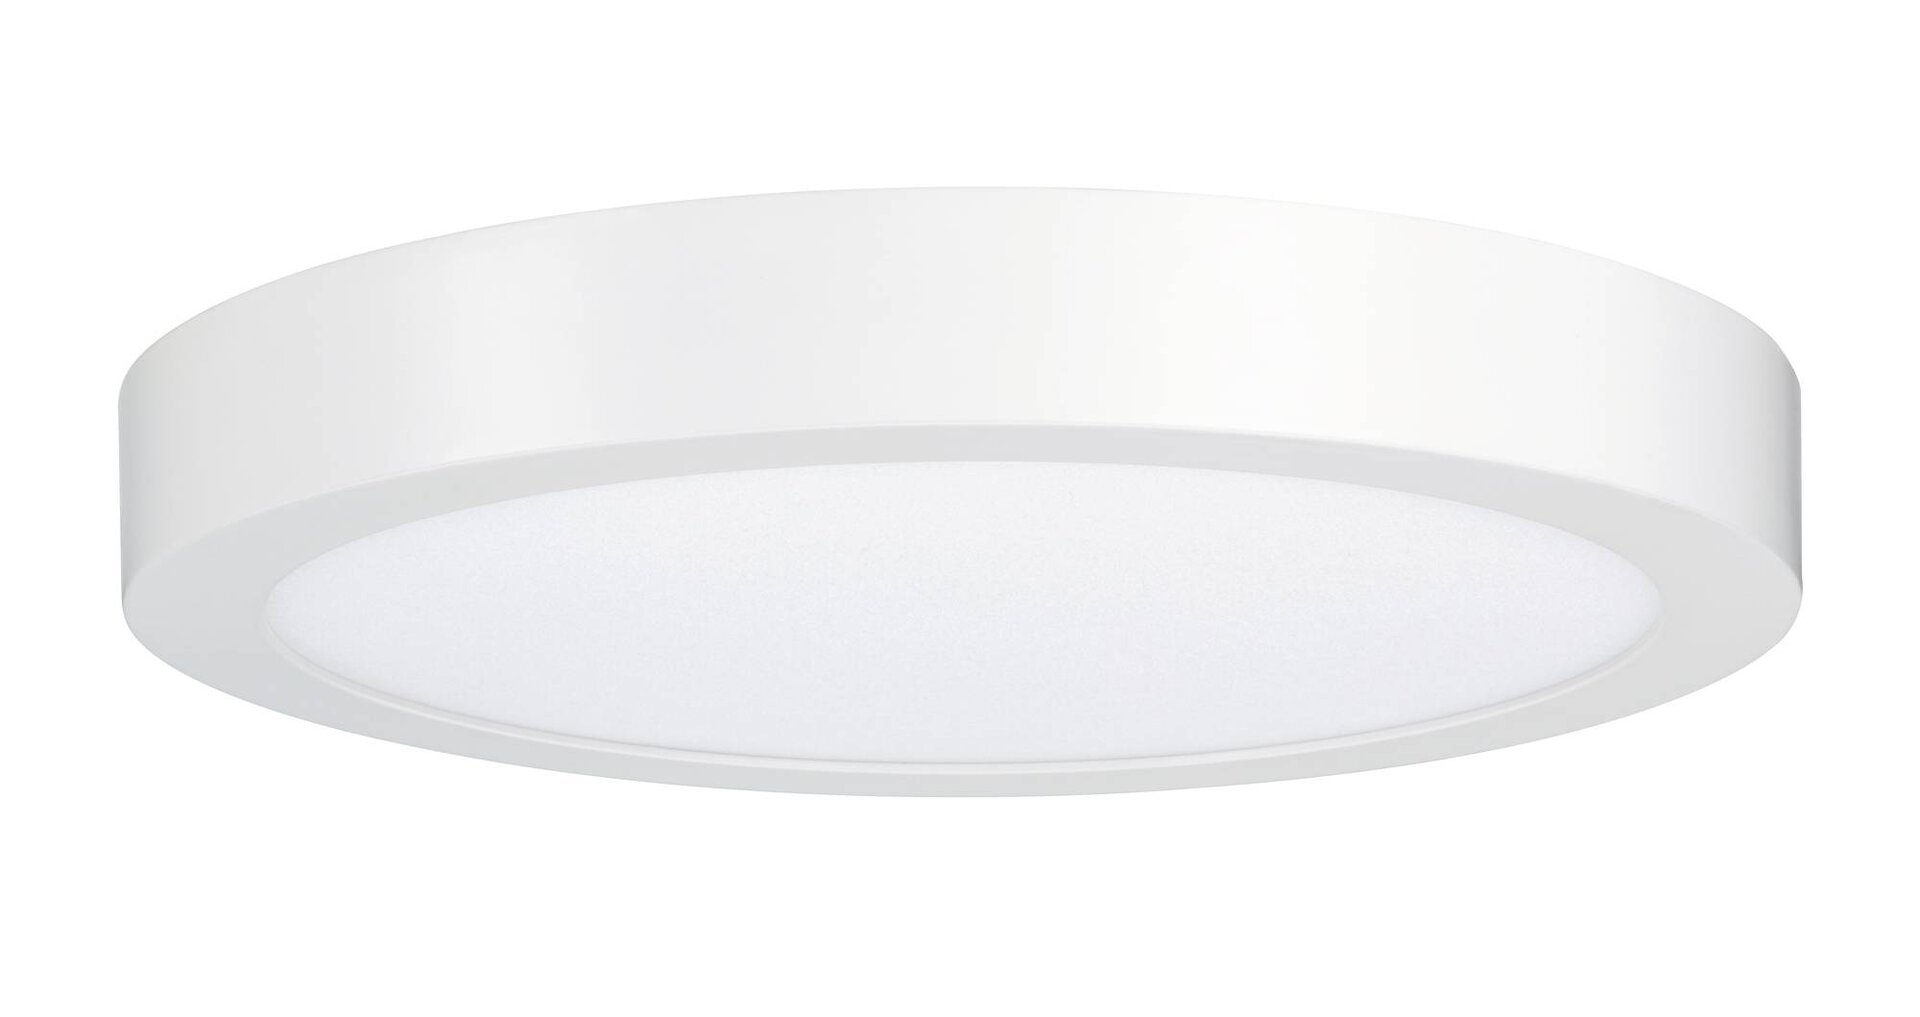 Deckenleuchte LUNAR Paulmann Metall weiß 30 x 4 x 30 cm